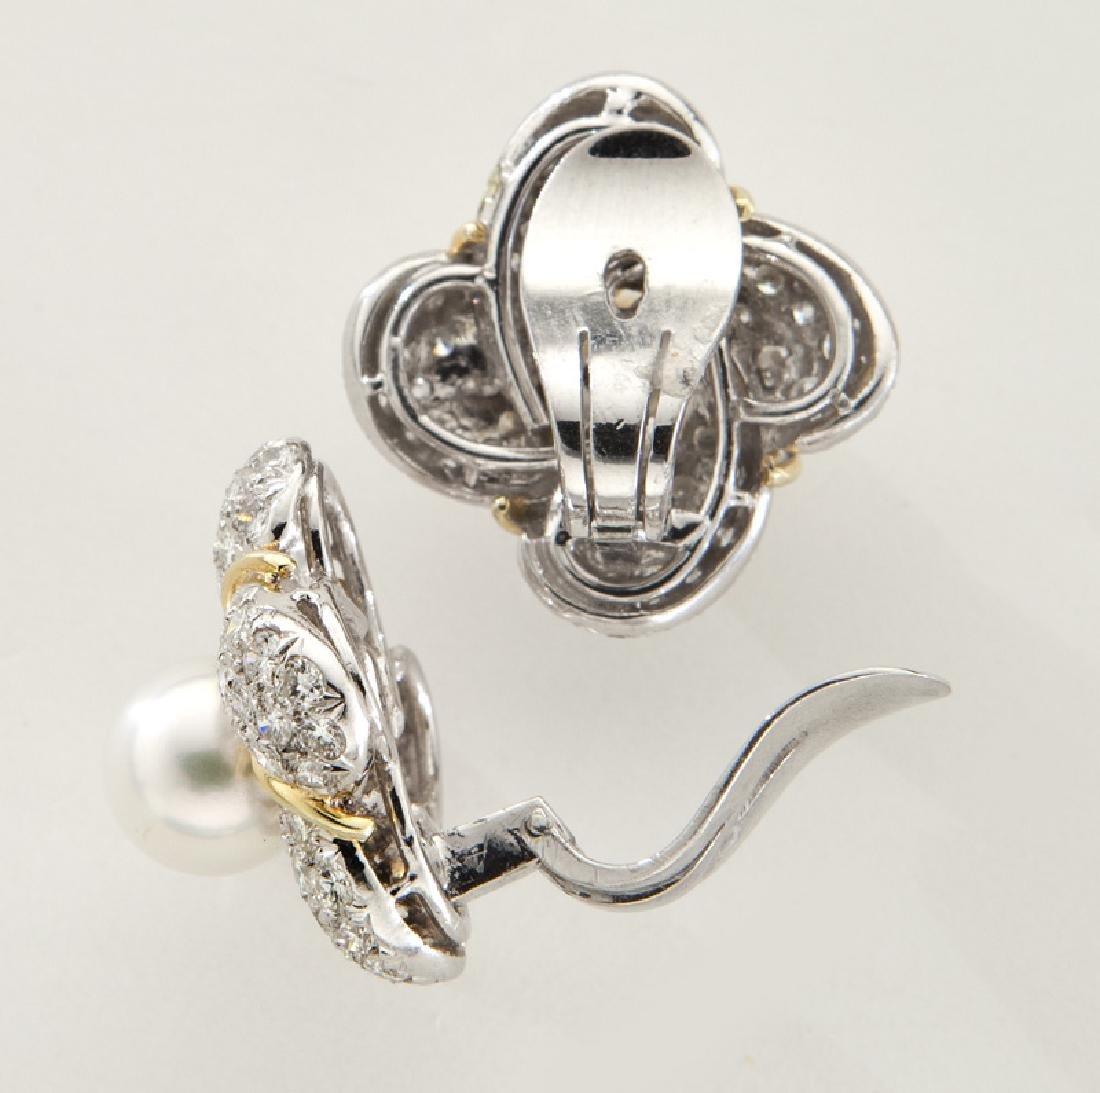 Pair of 18K gold, diamond and Akoya pearl earrings - 2